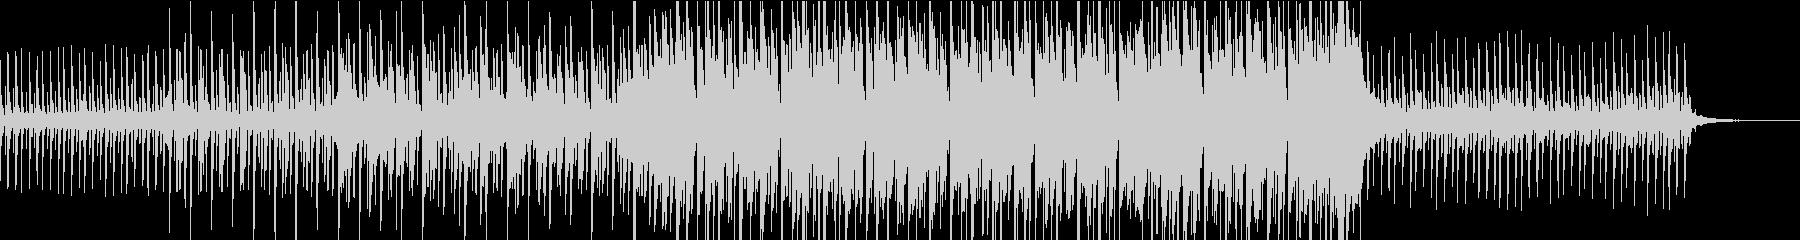 CM向けシンセのフレーズが繰り返される曲の未再生の波形